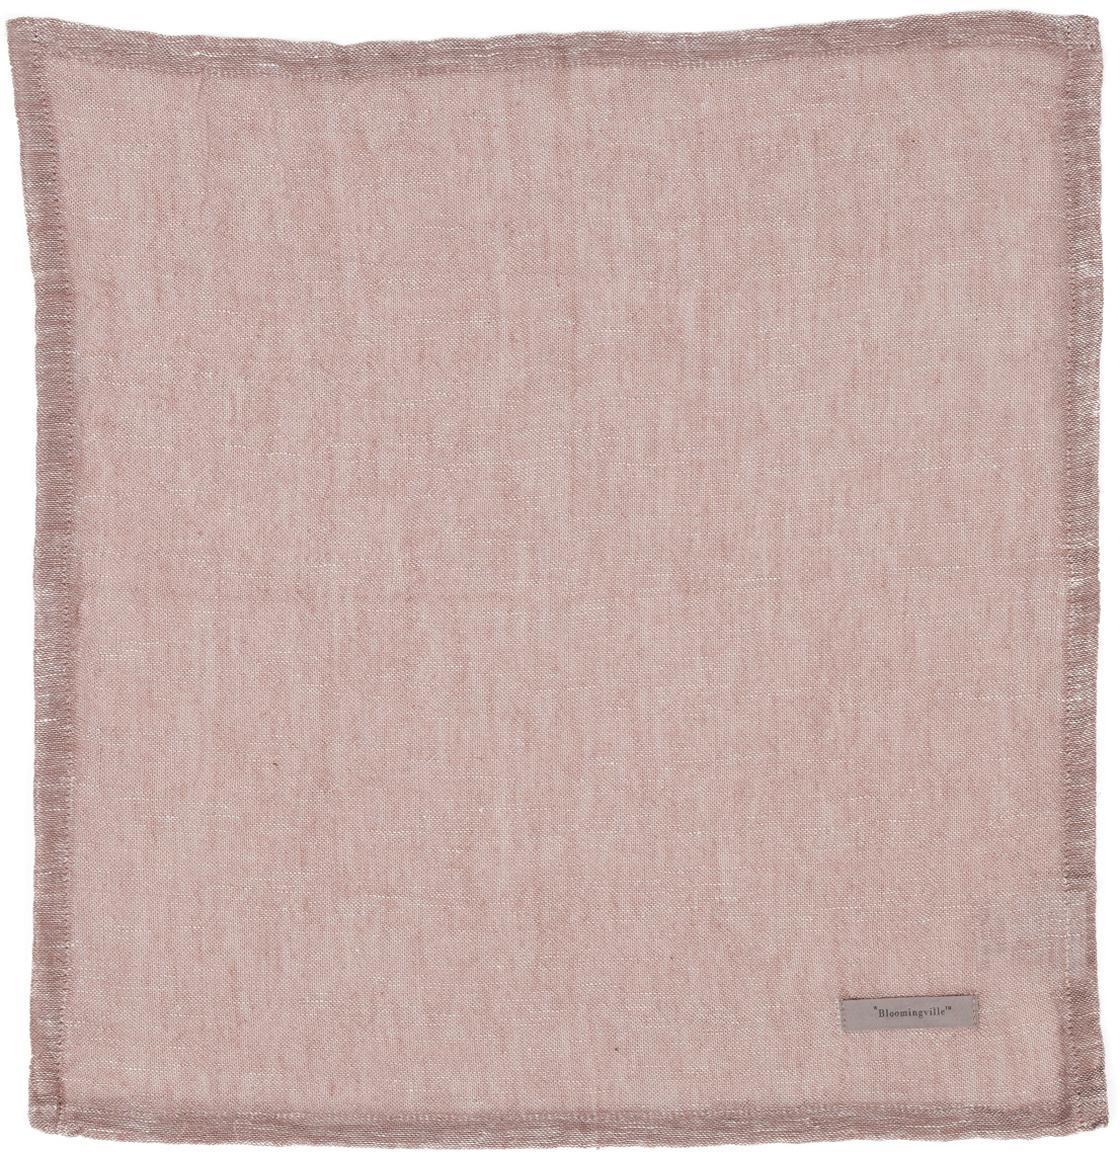 Servetten Kinia, 4 stuks, 55% katoen, 45% linnen, Roze, 45 x 45 cm